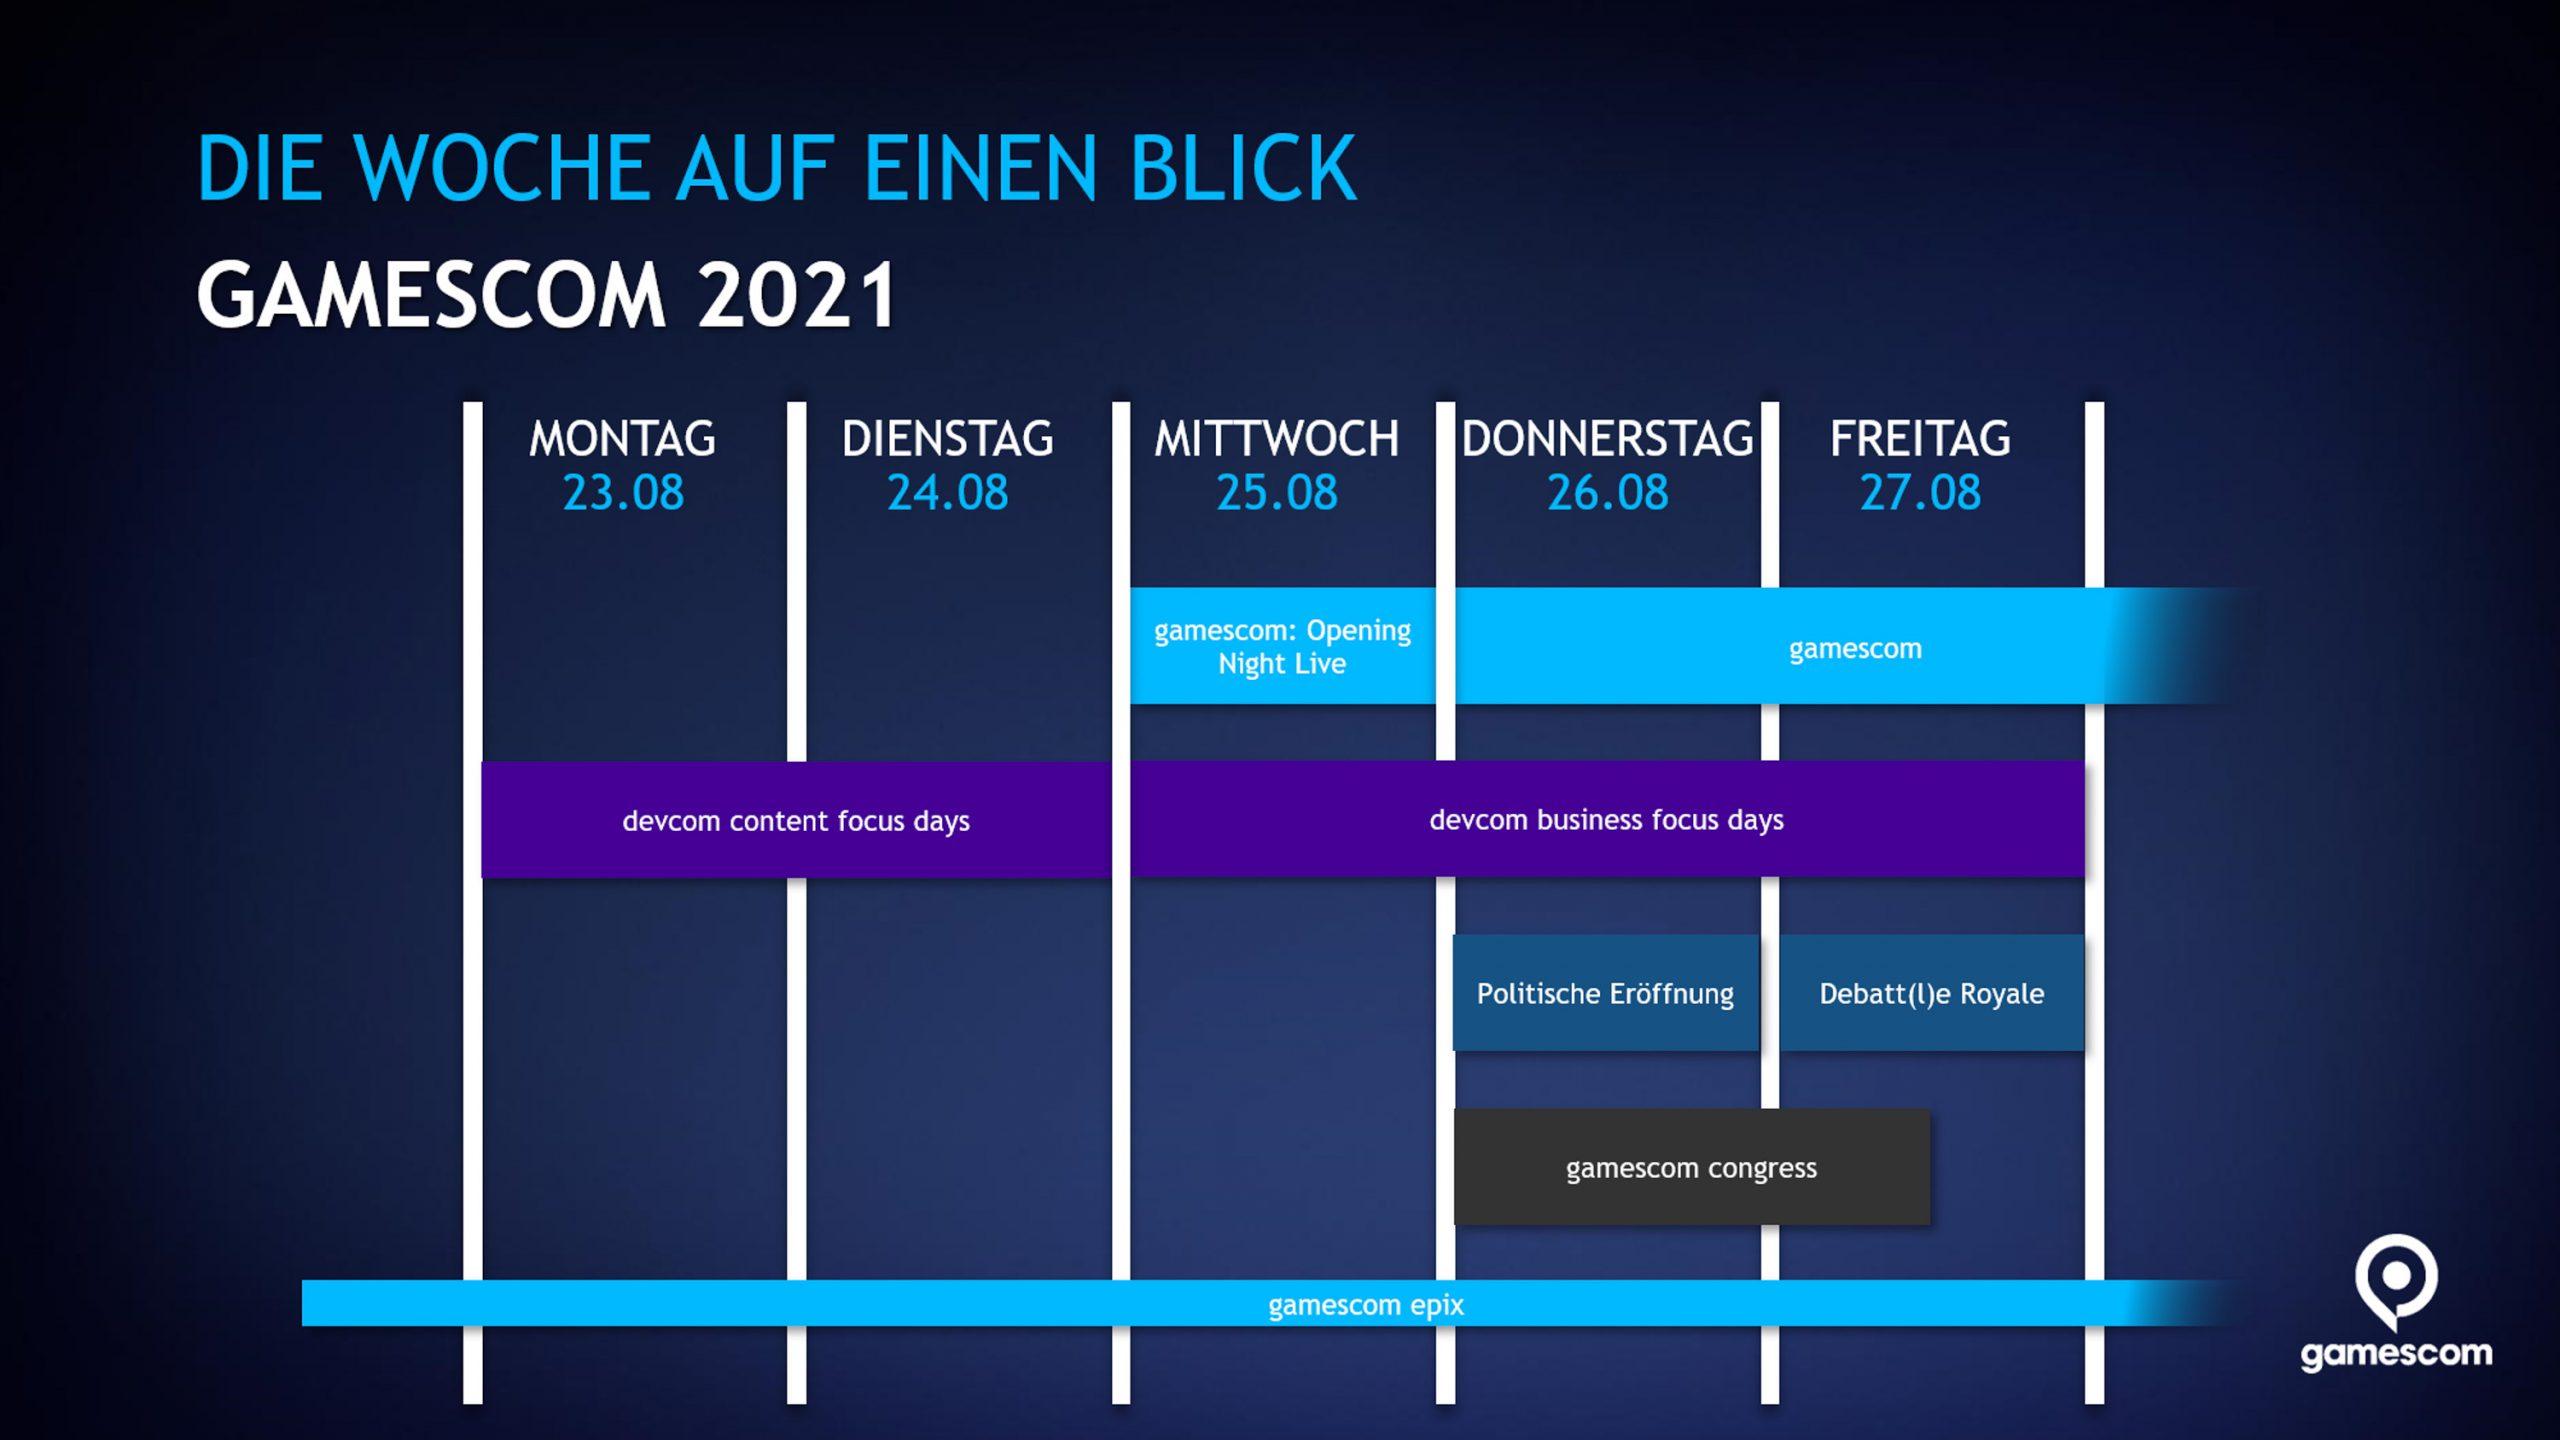 gamescom 21 Programm